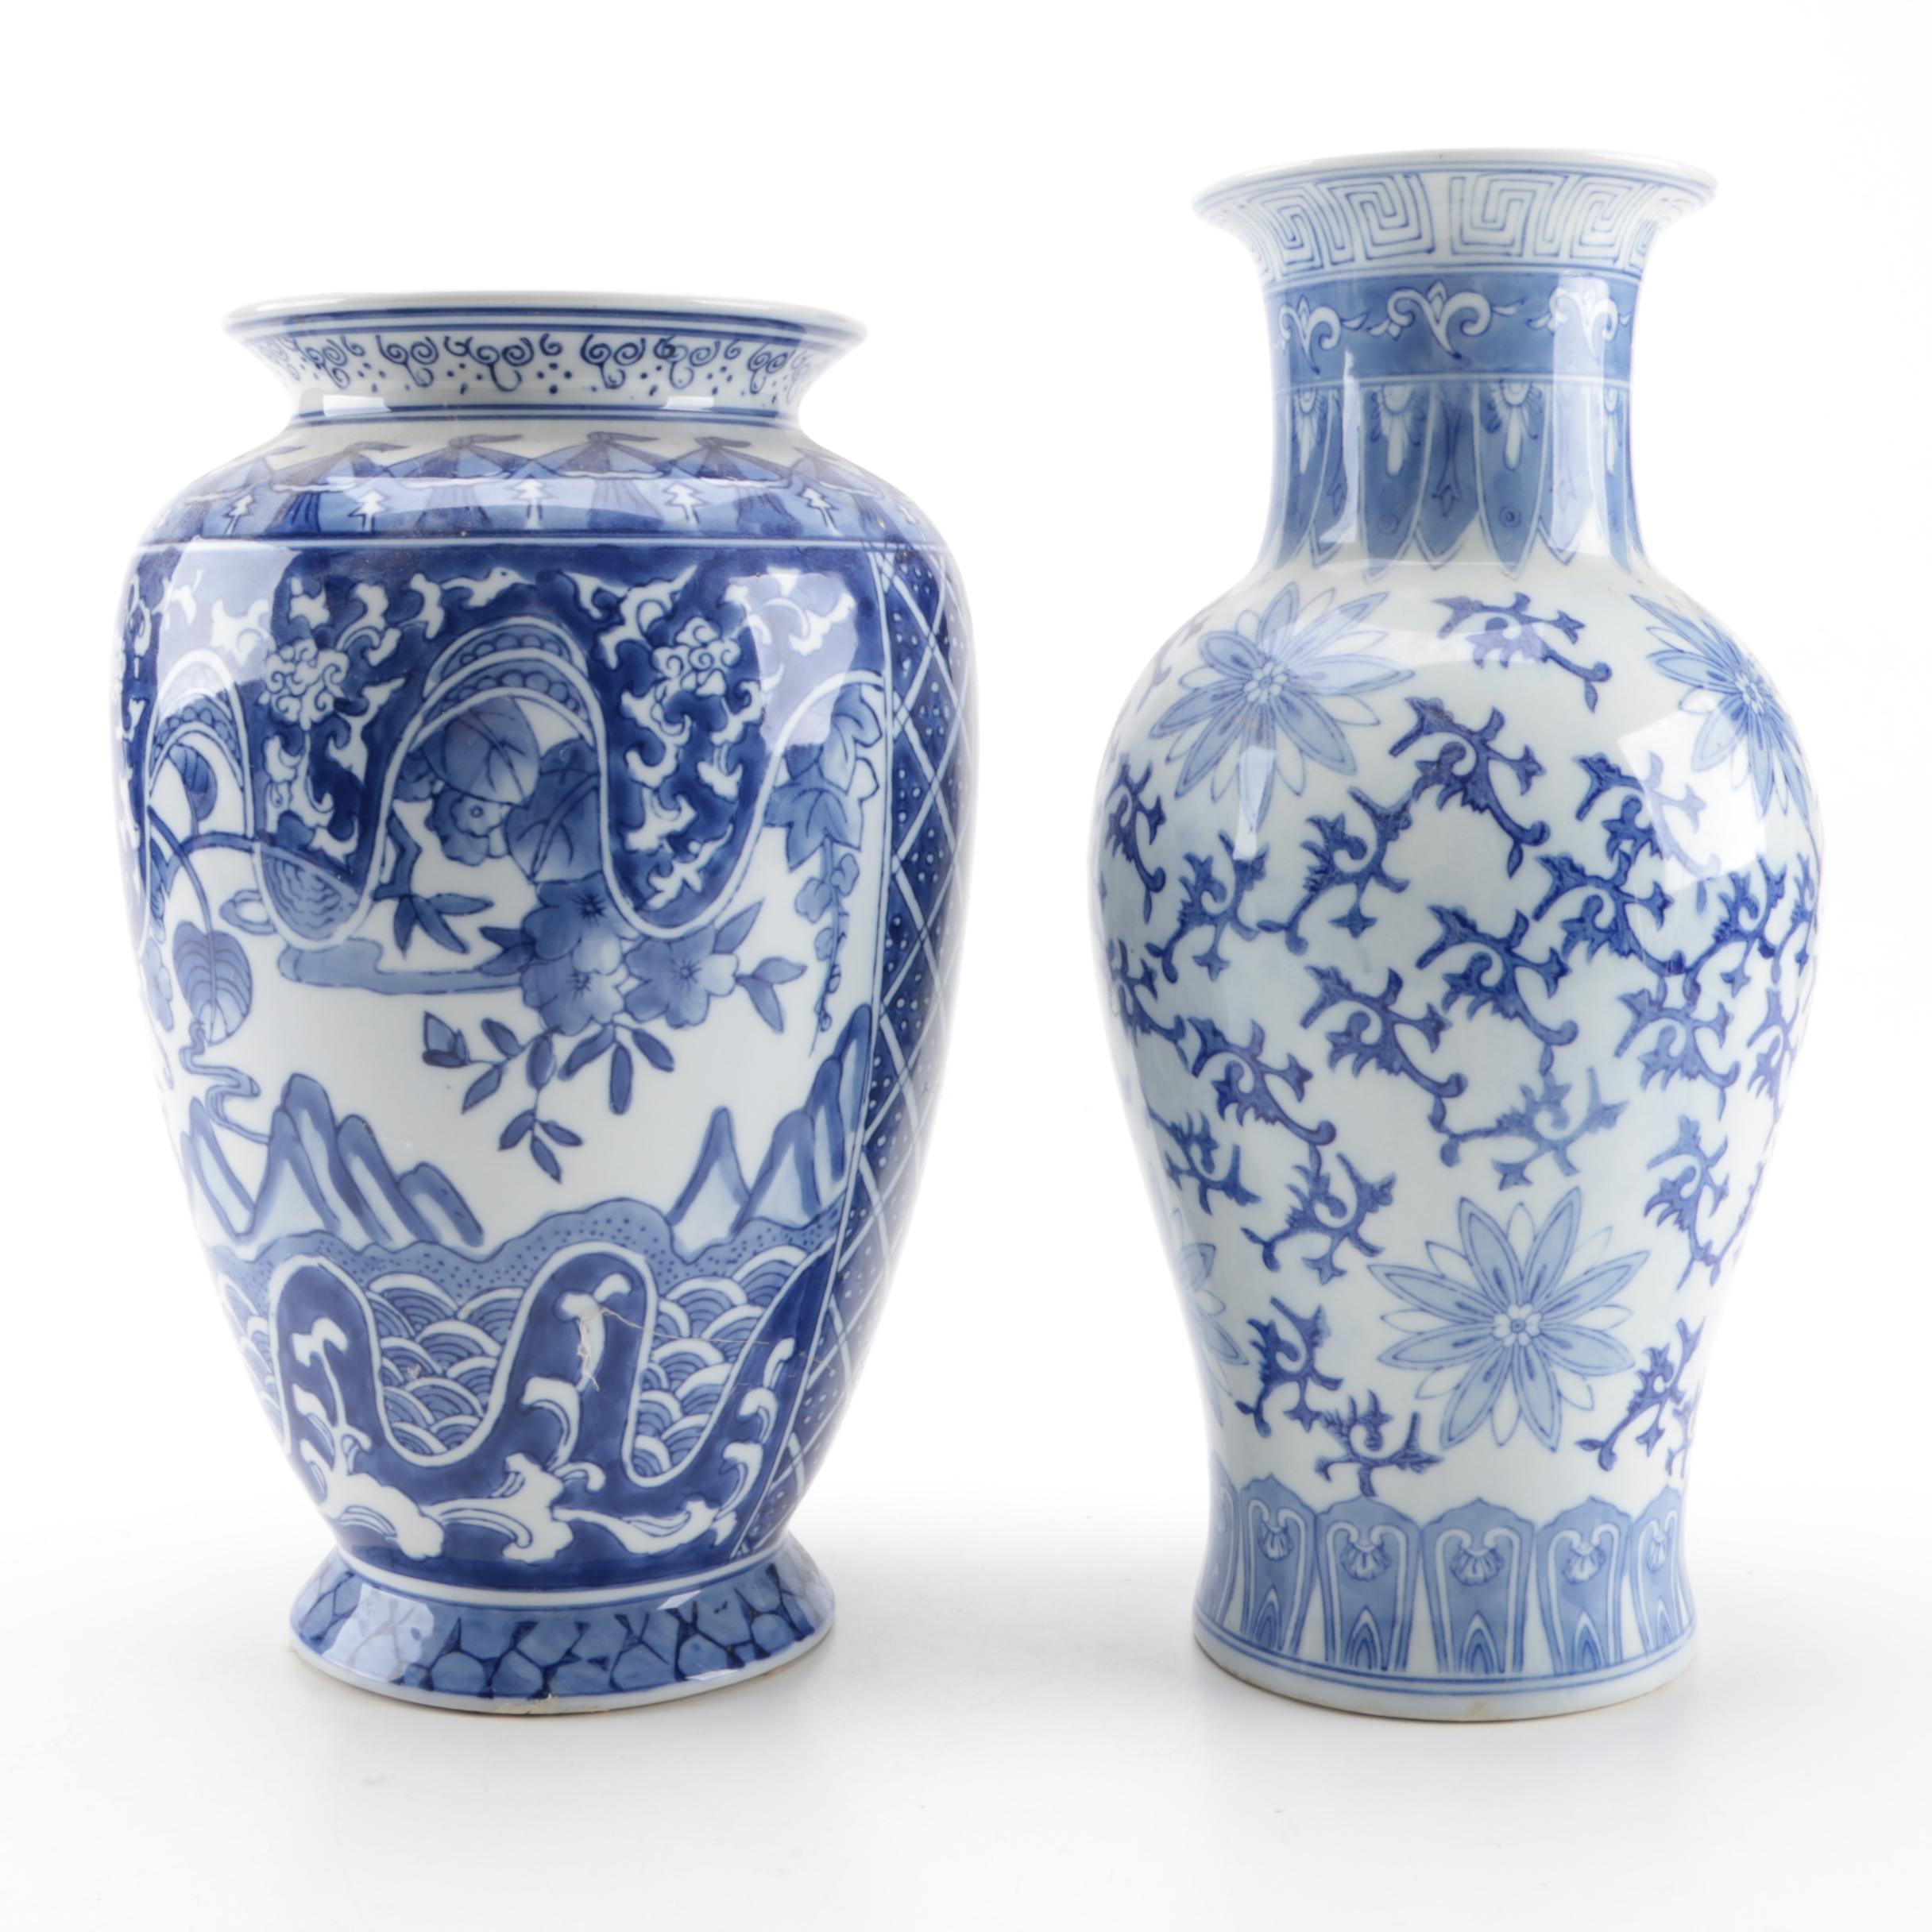 East Asian Blue and White Porcelain Vases